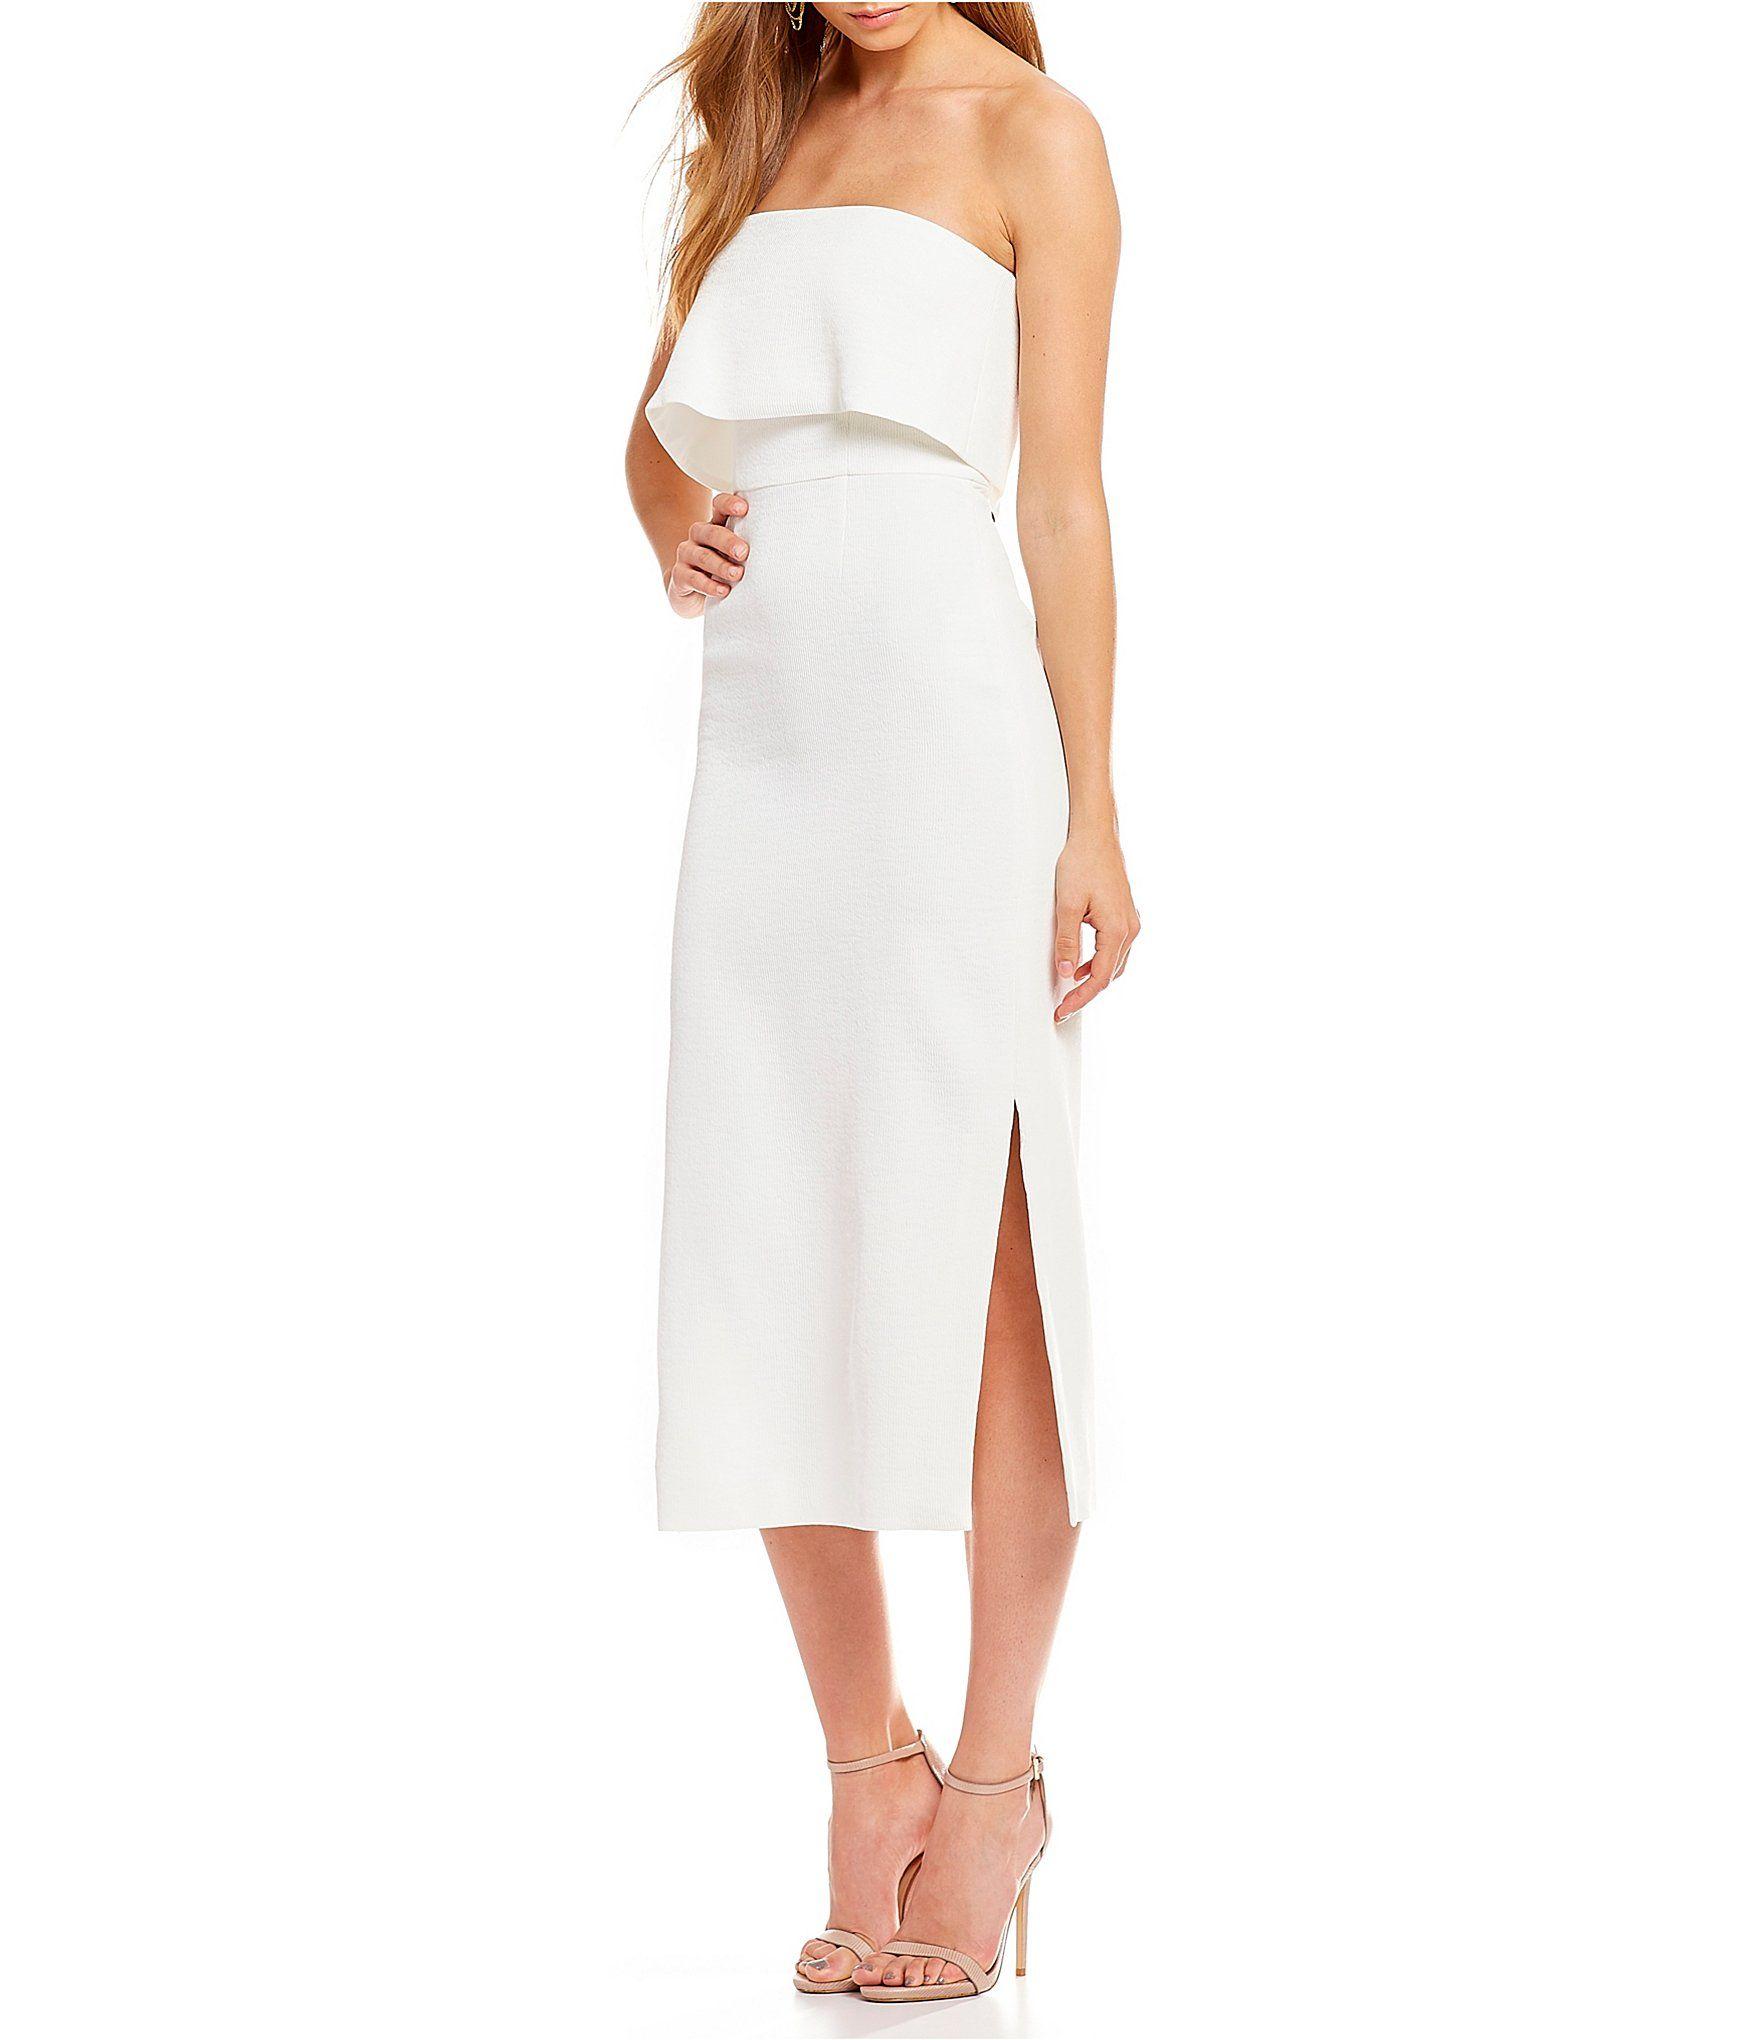 43e4c2e1316 Shop for CeCe Halter Neck Ruffled Sheath Dress at Dillards.com. Visit  Dillards.com to find clothing